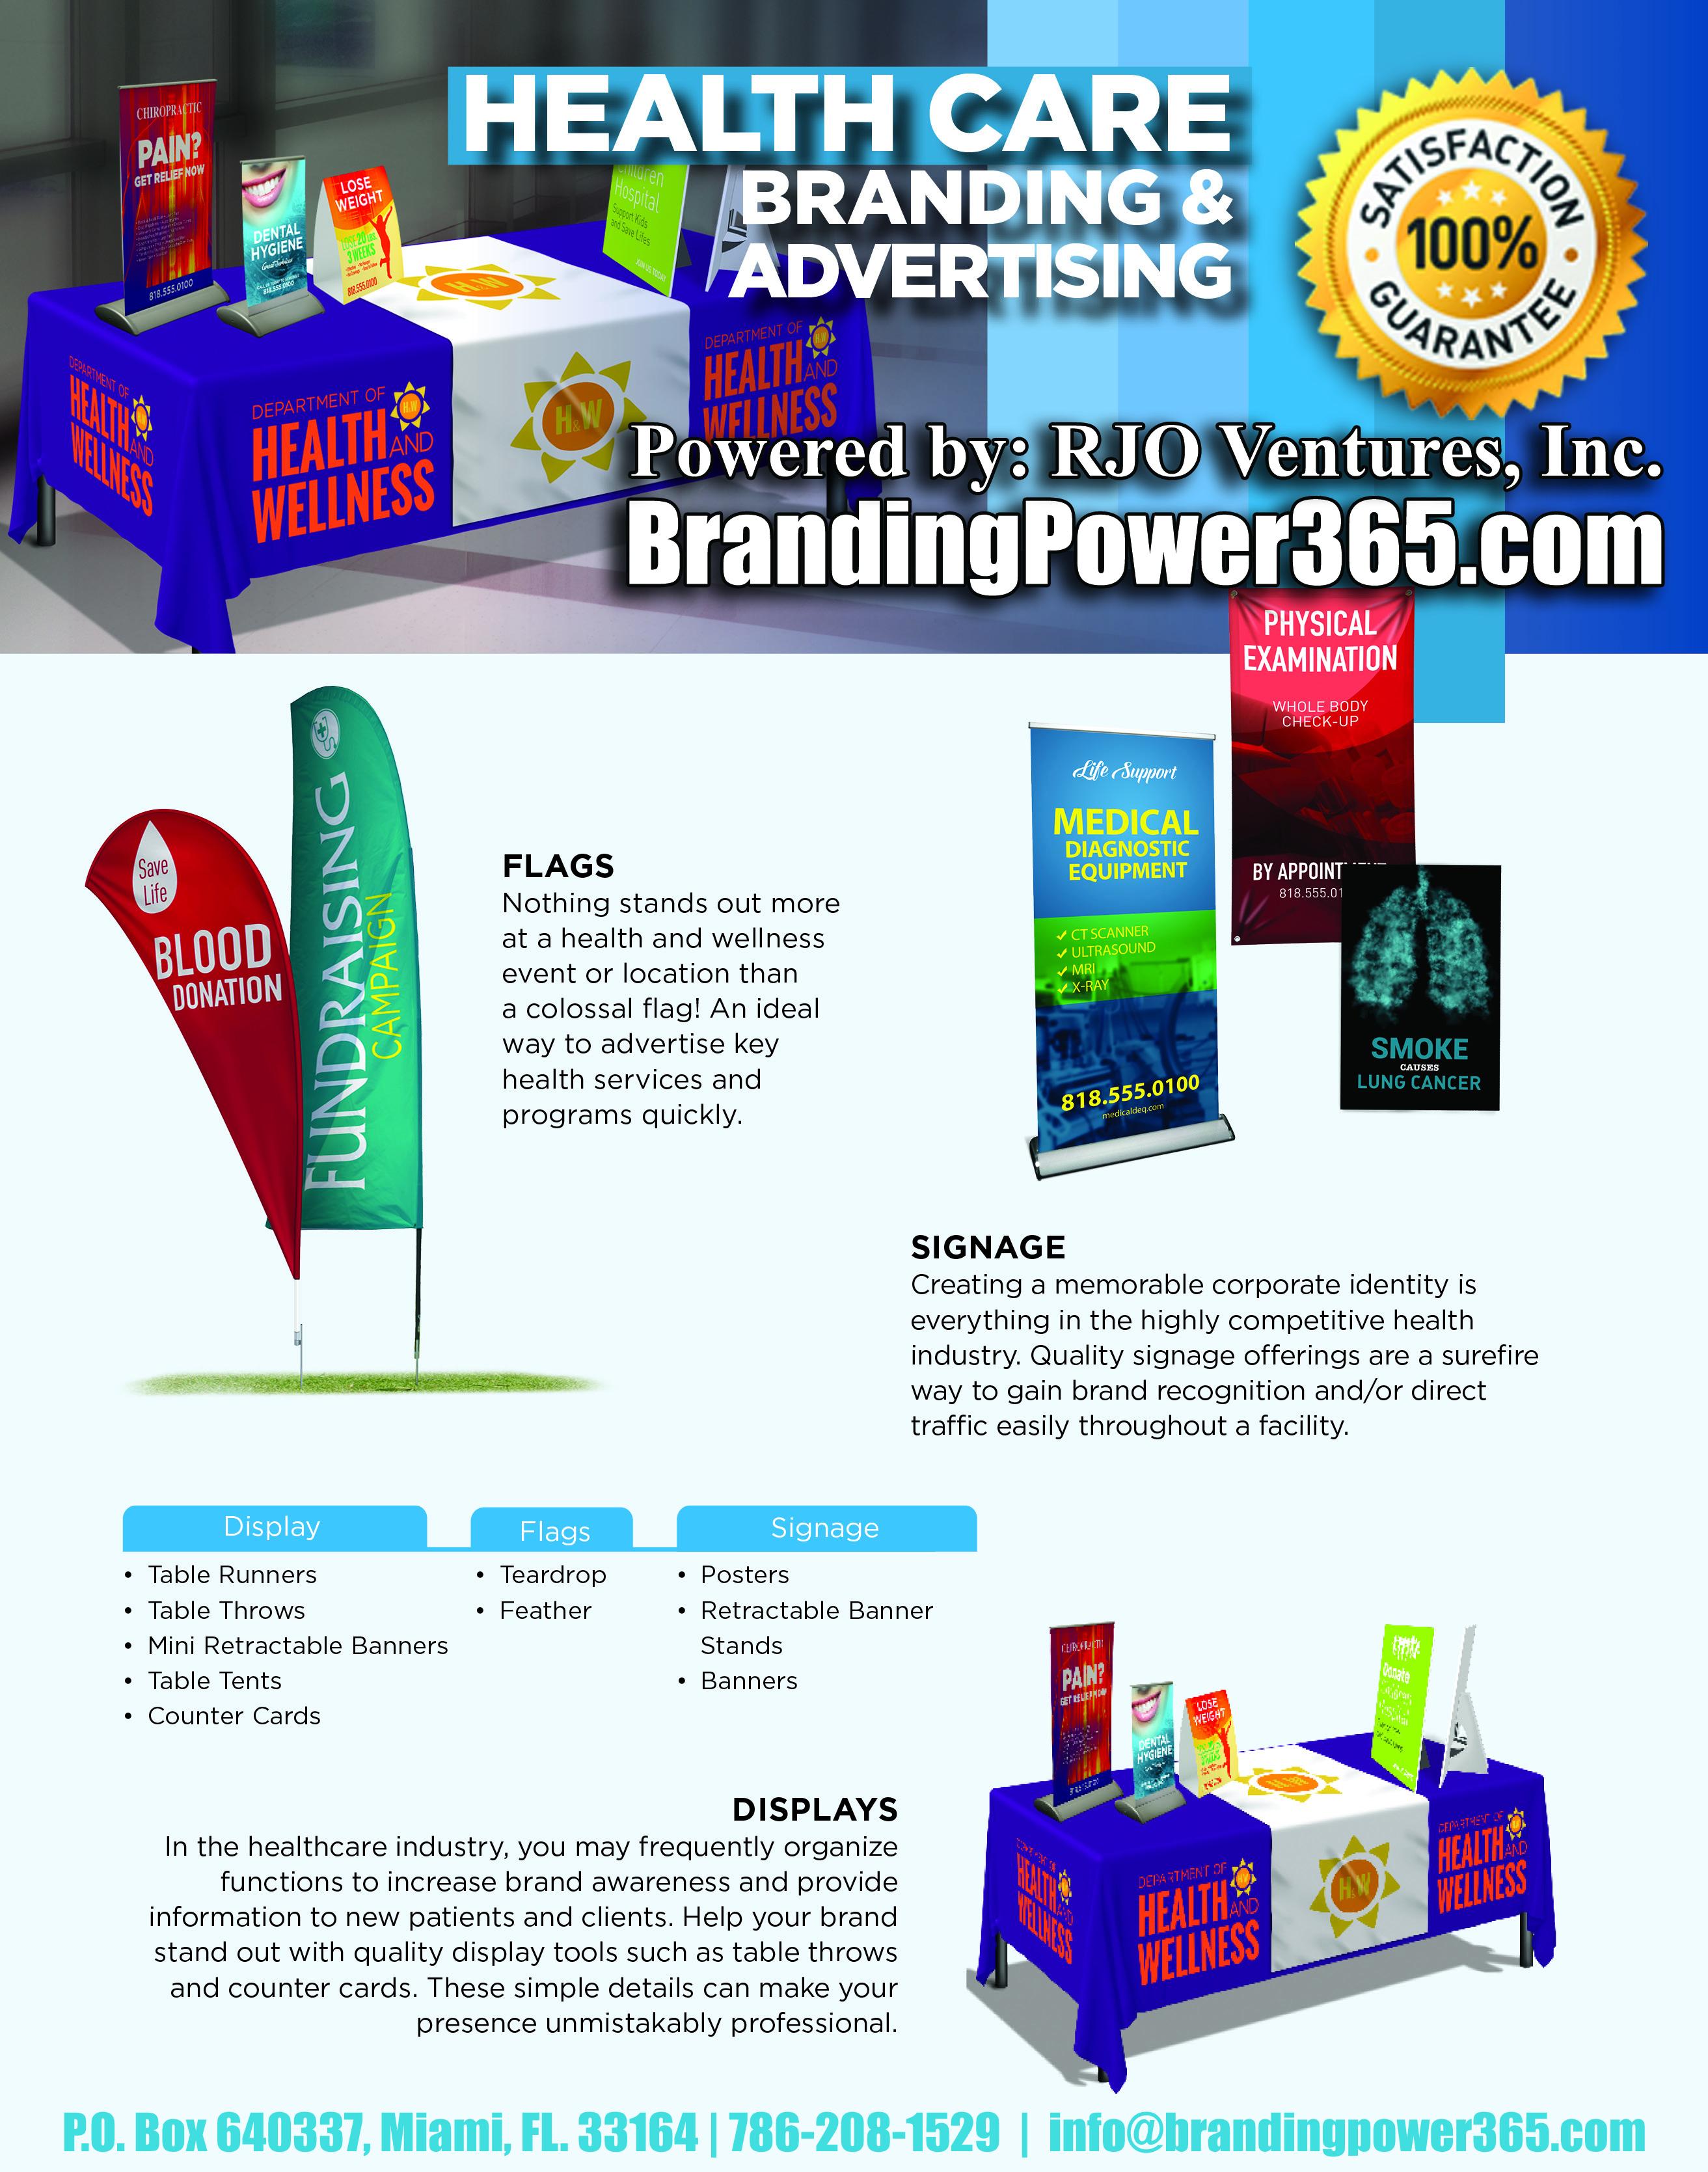 Healthcare Branding and Advertising (BrandingPower365.com). Powered by RJO Ventures, Inc.